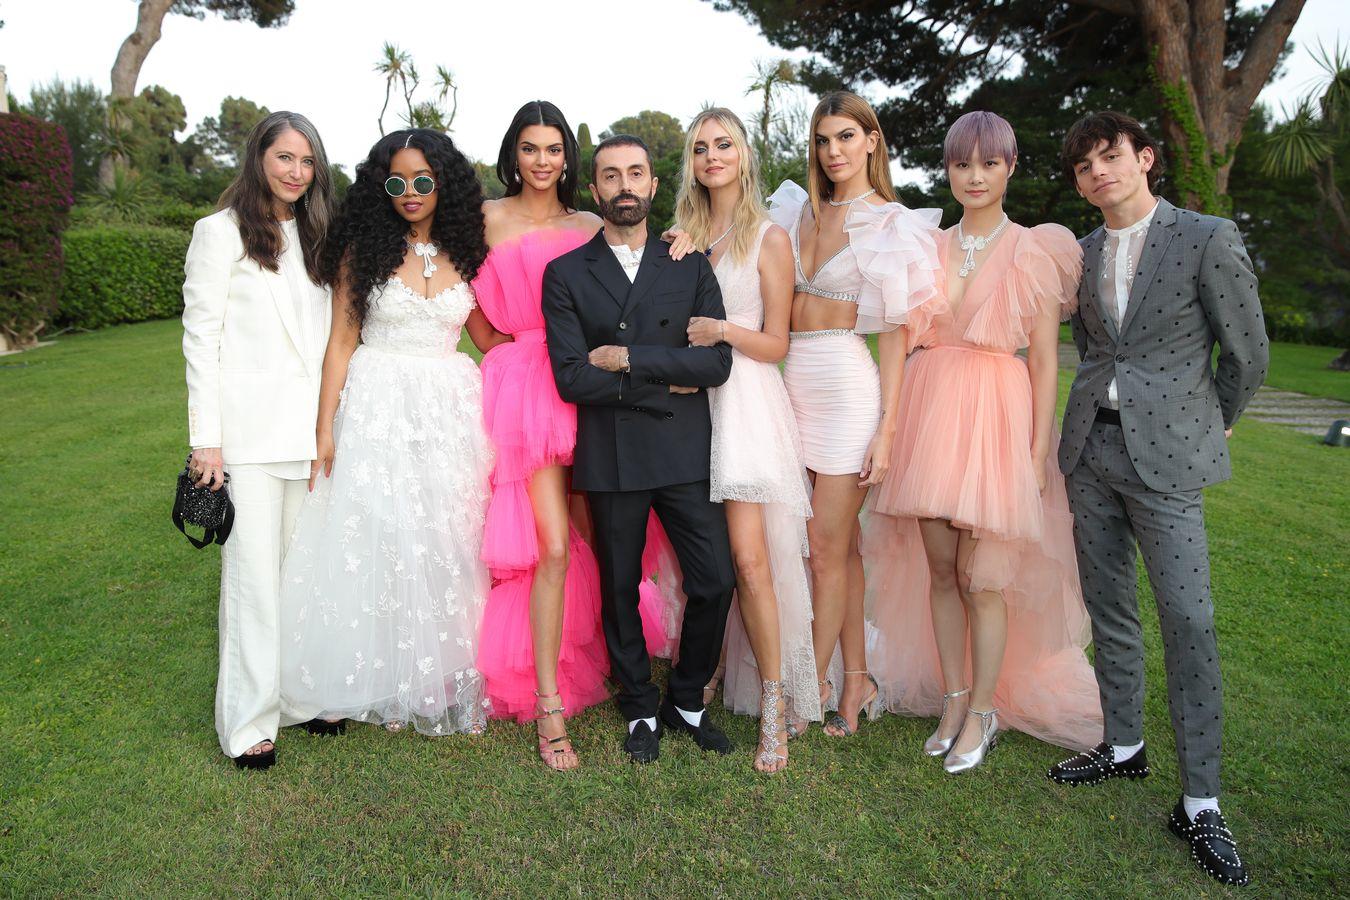 Giambattista Valli X H&M collaboration debuts designer's very first menswear line